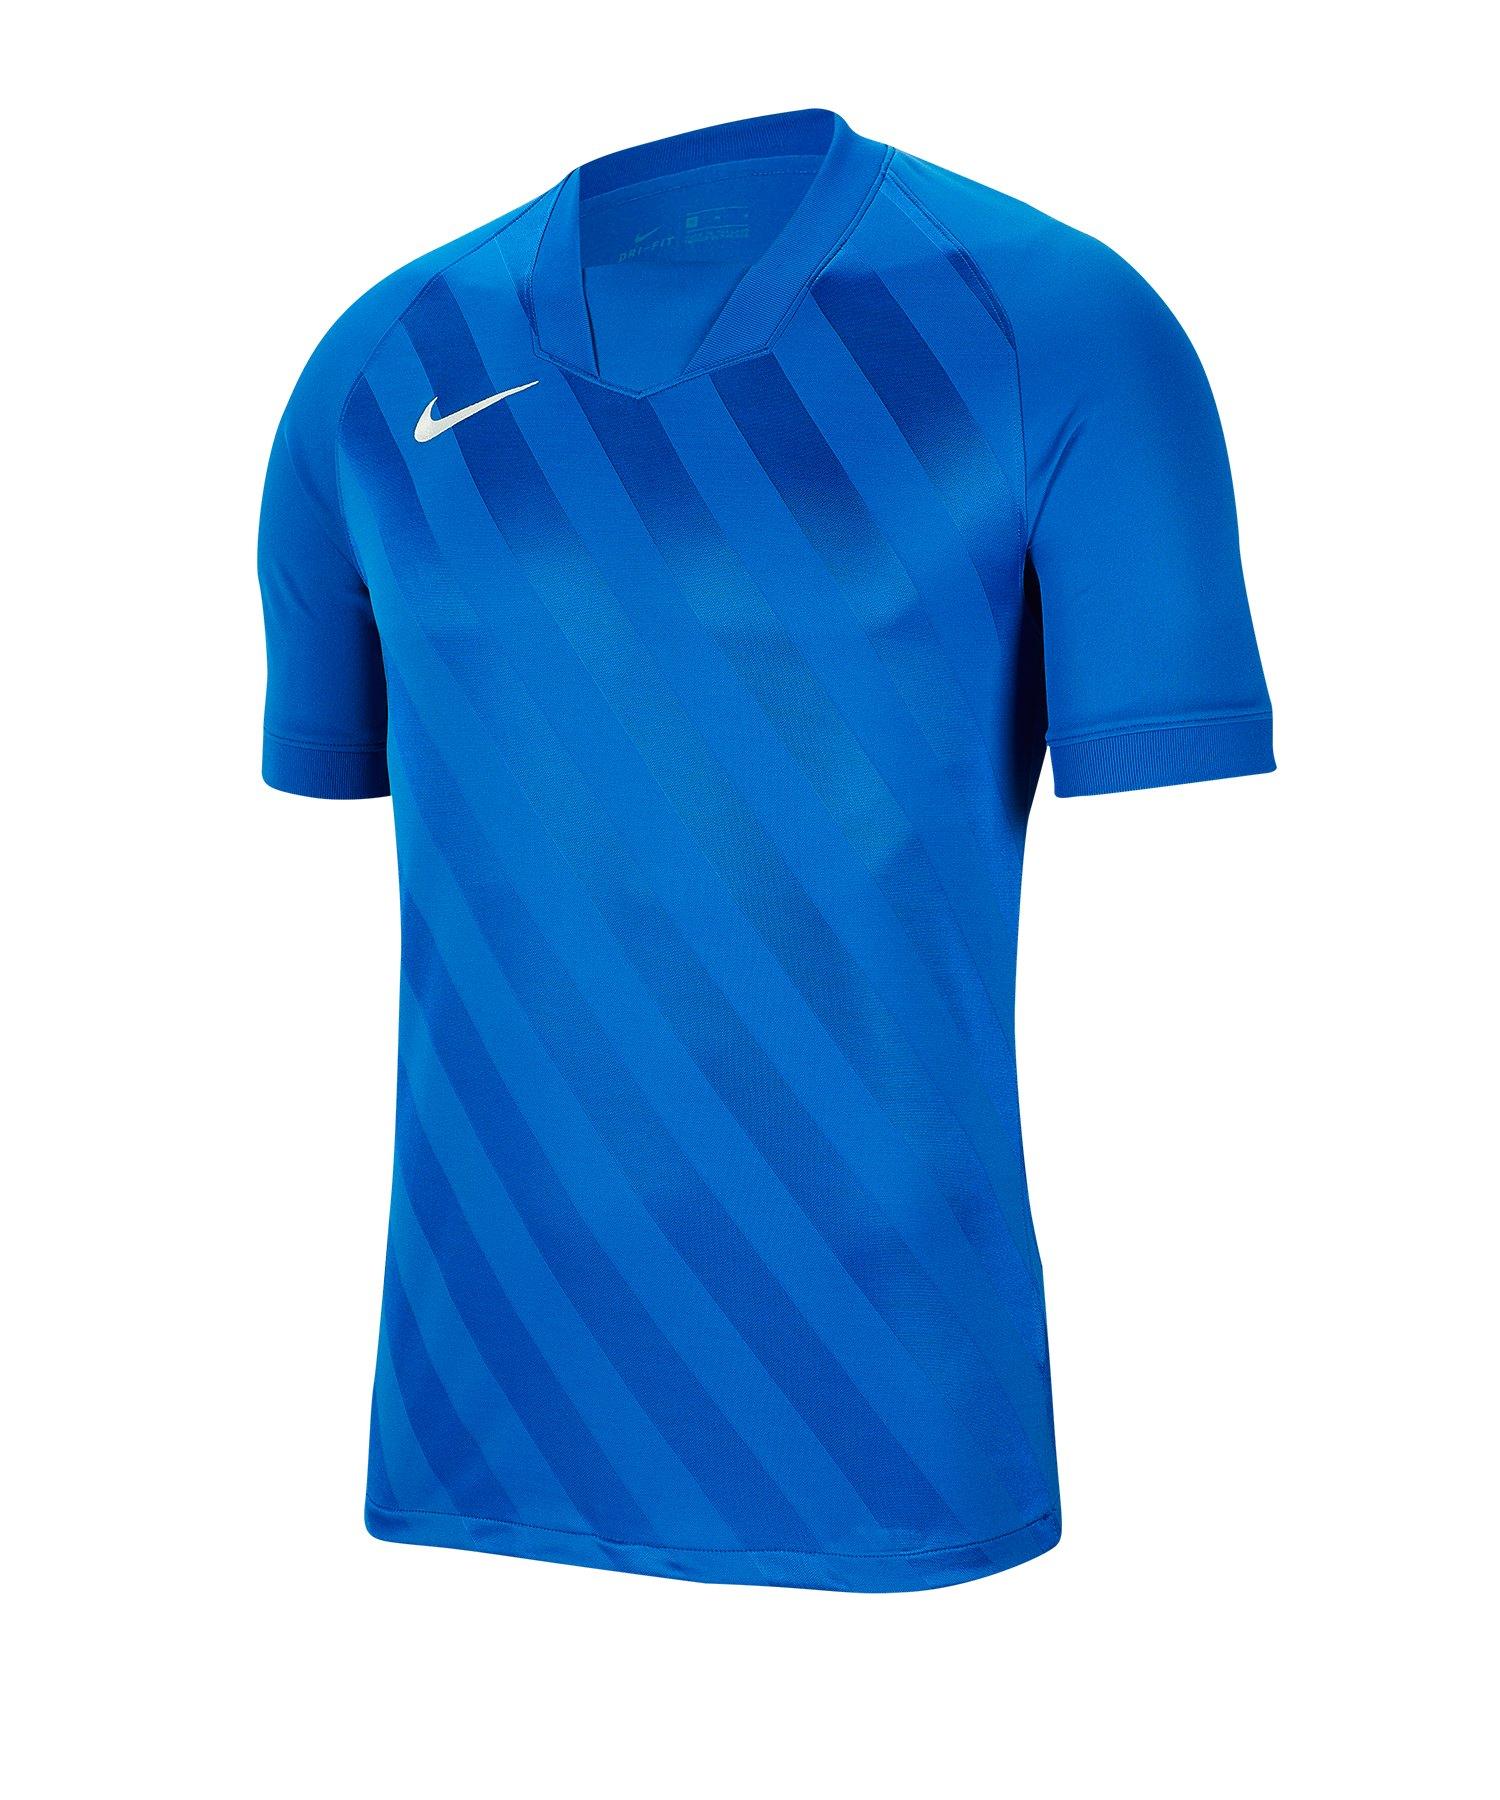 Nike Challenge III Trikot Kids Blau F463 - blau